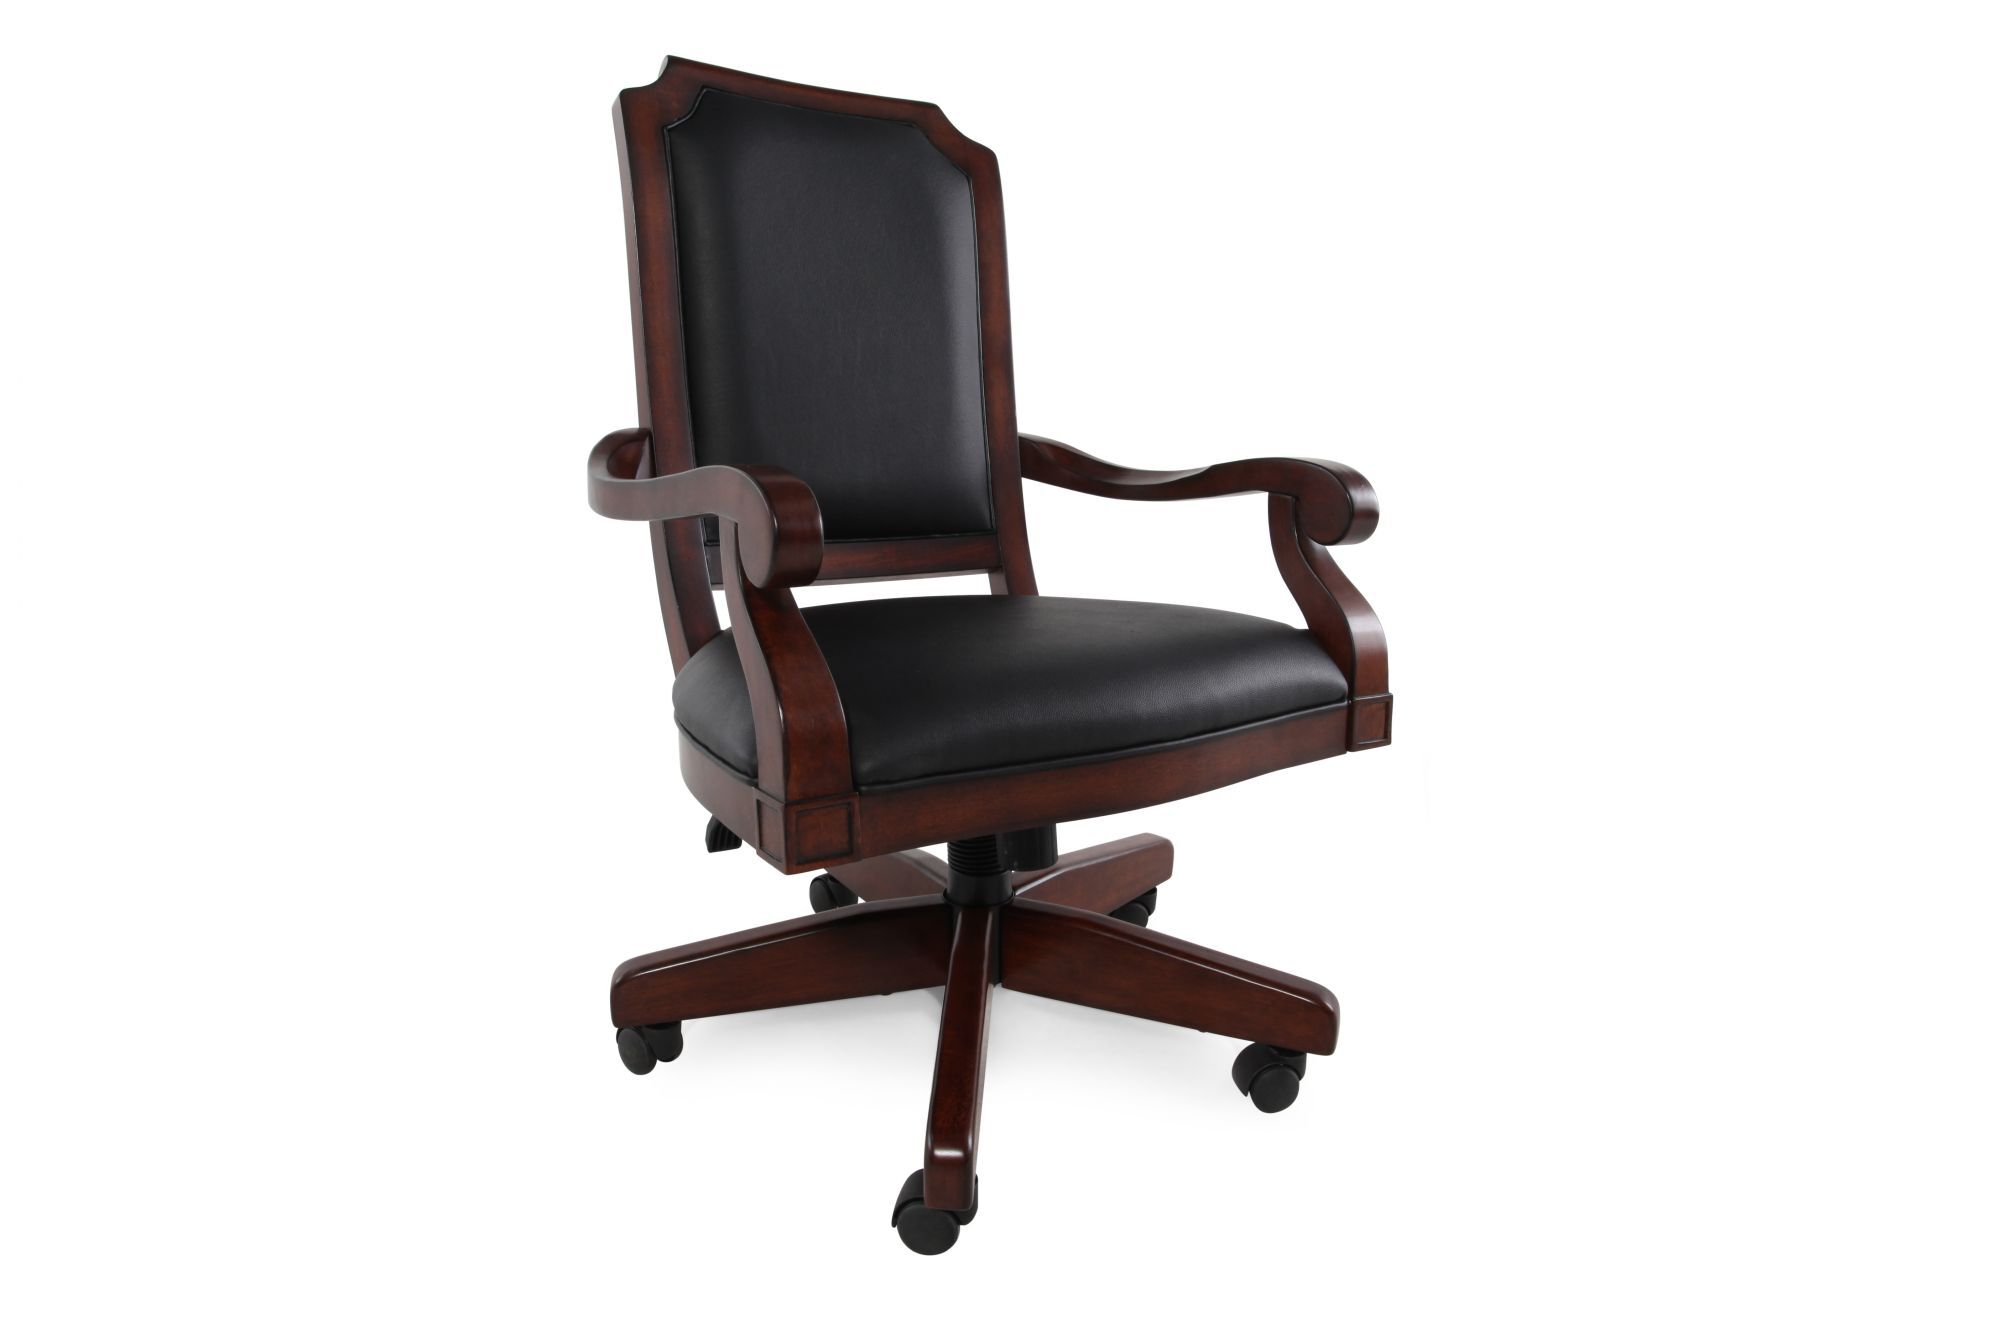 Casters Swivel Office Chair In Dark Cherry